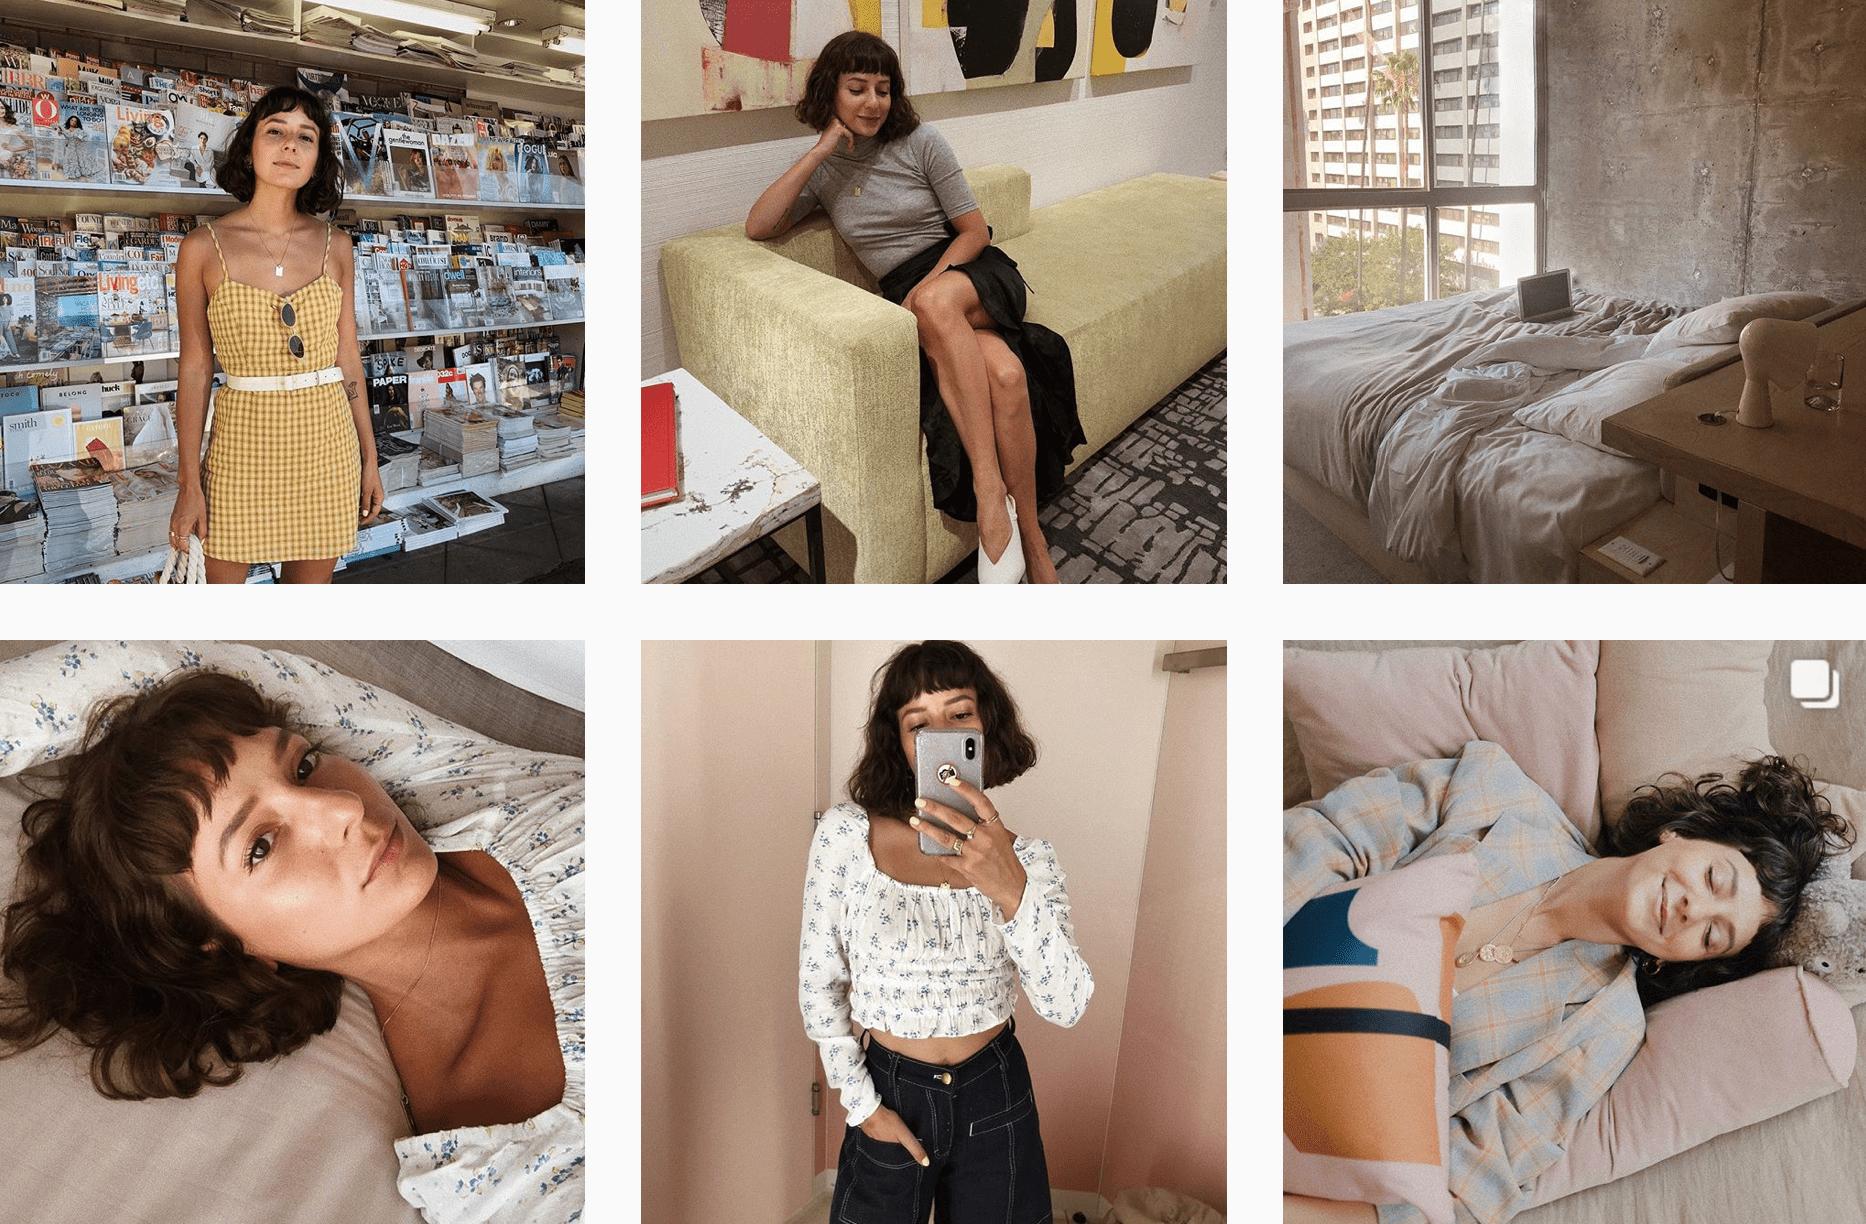 PLANOLY x Alyssa Coscarelli